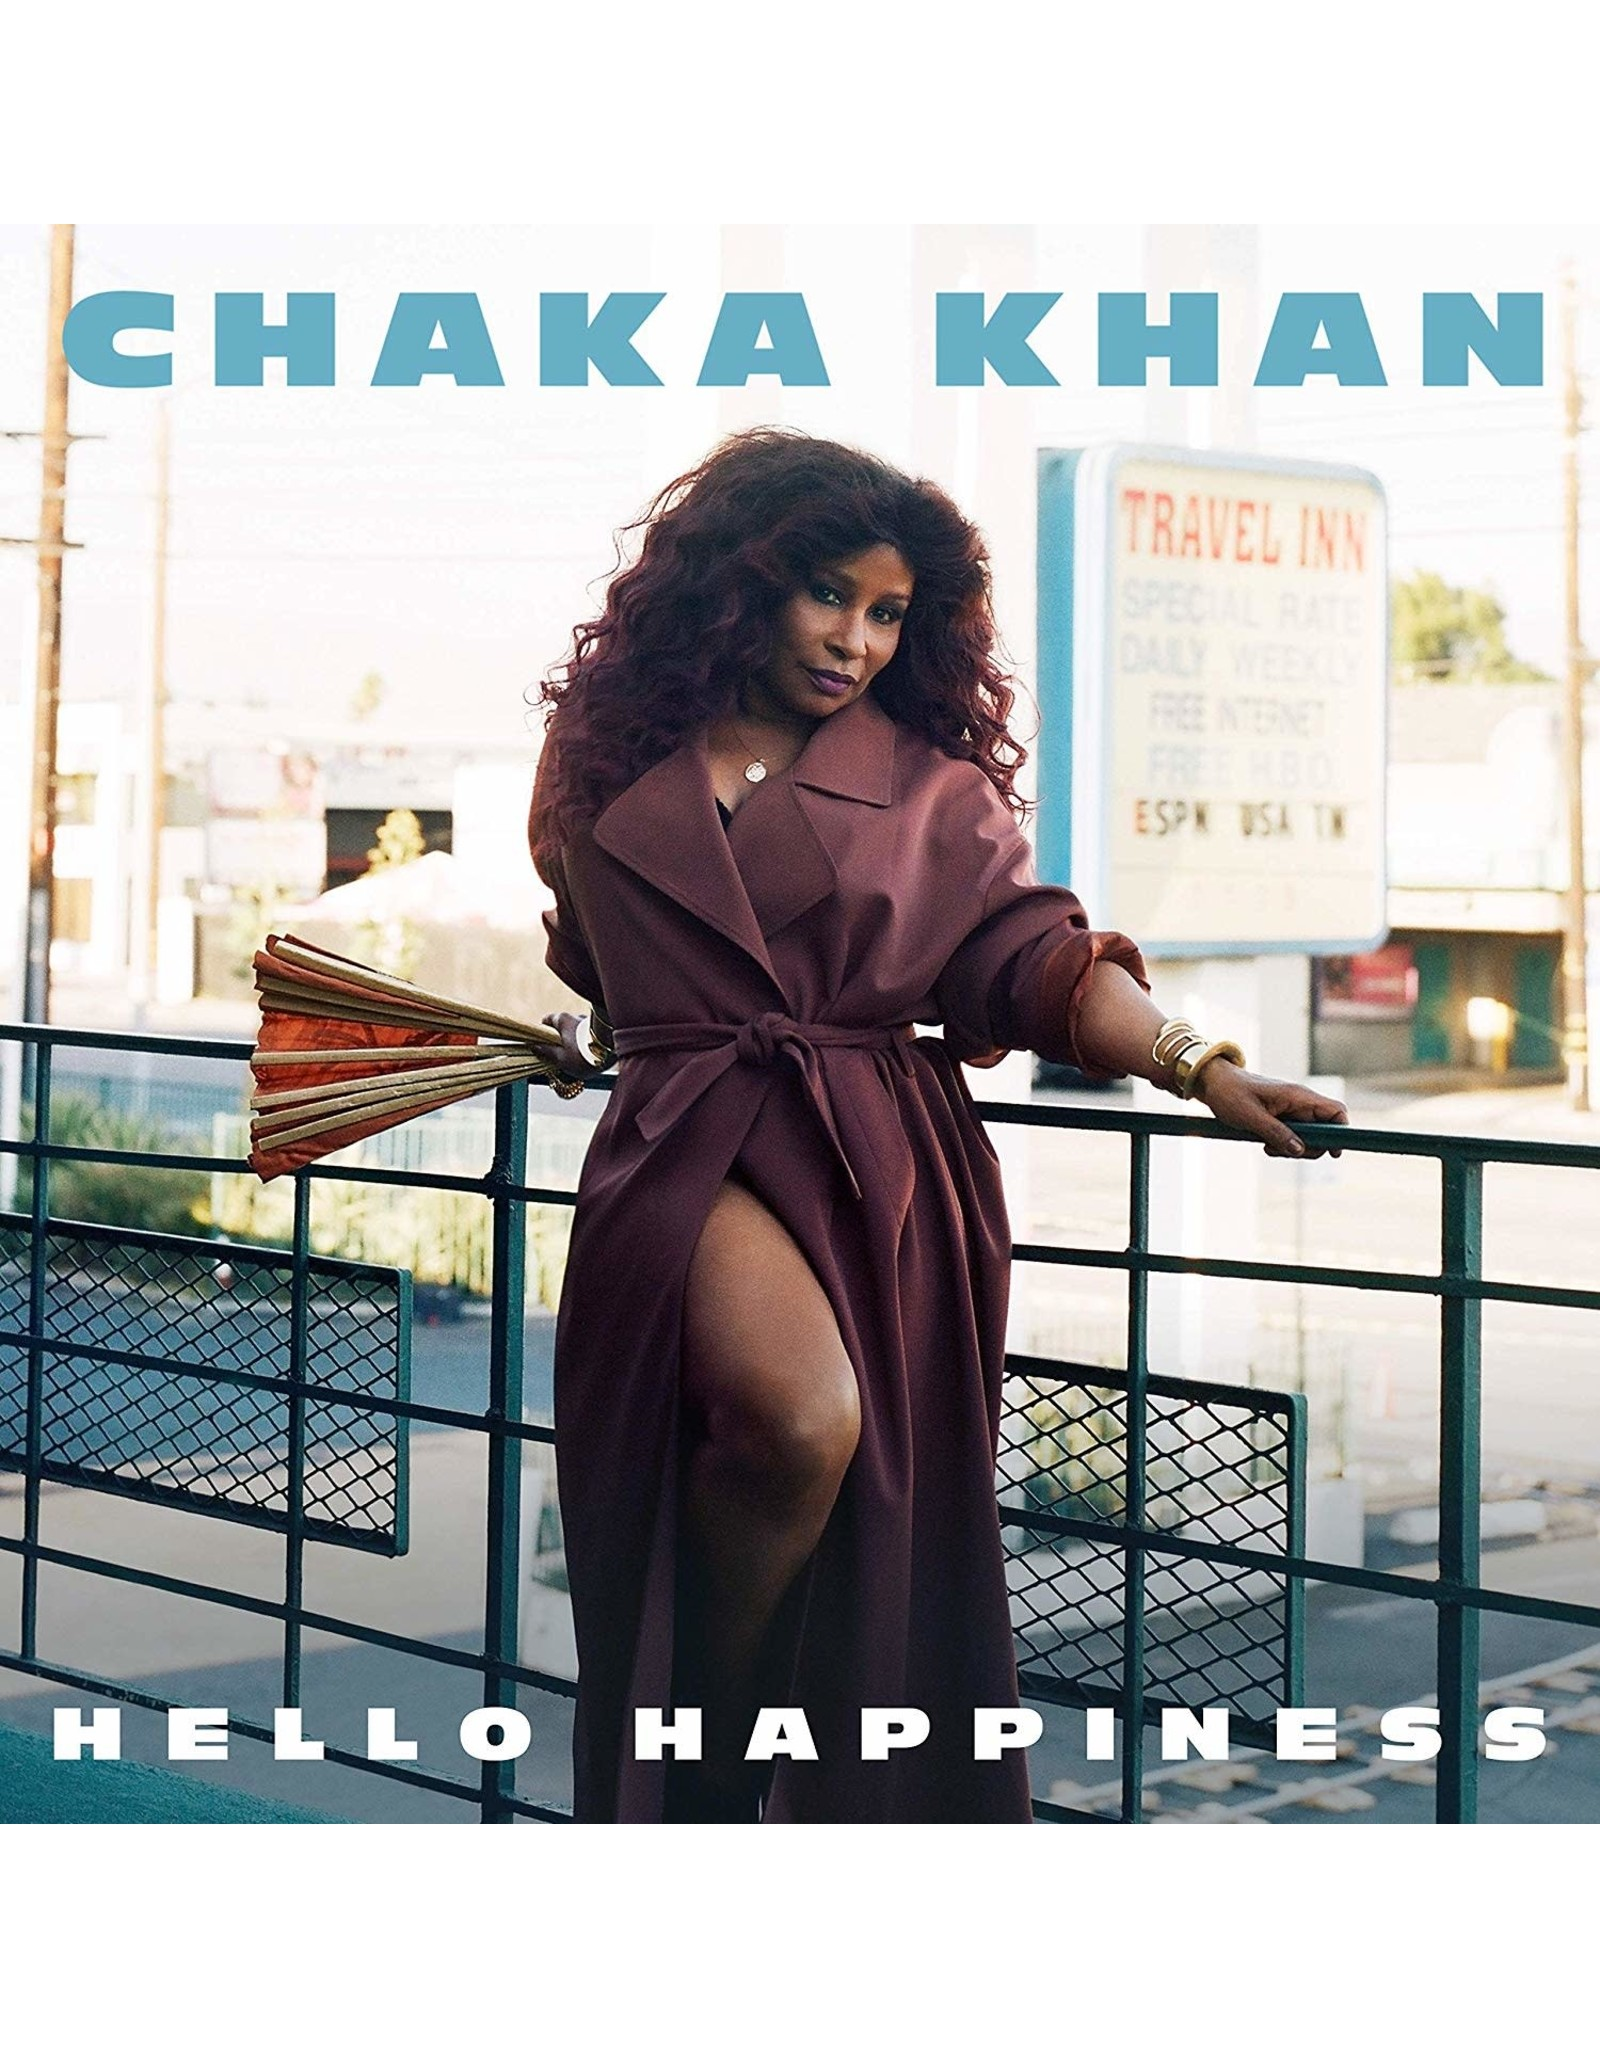 Kahn, Chaka - Hello Happiness CD